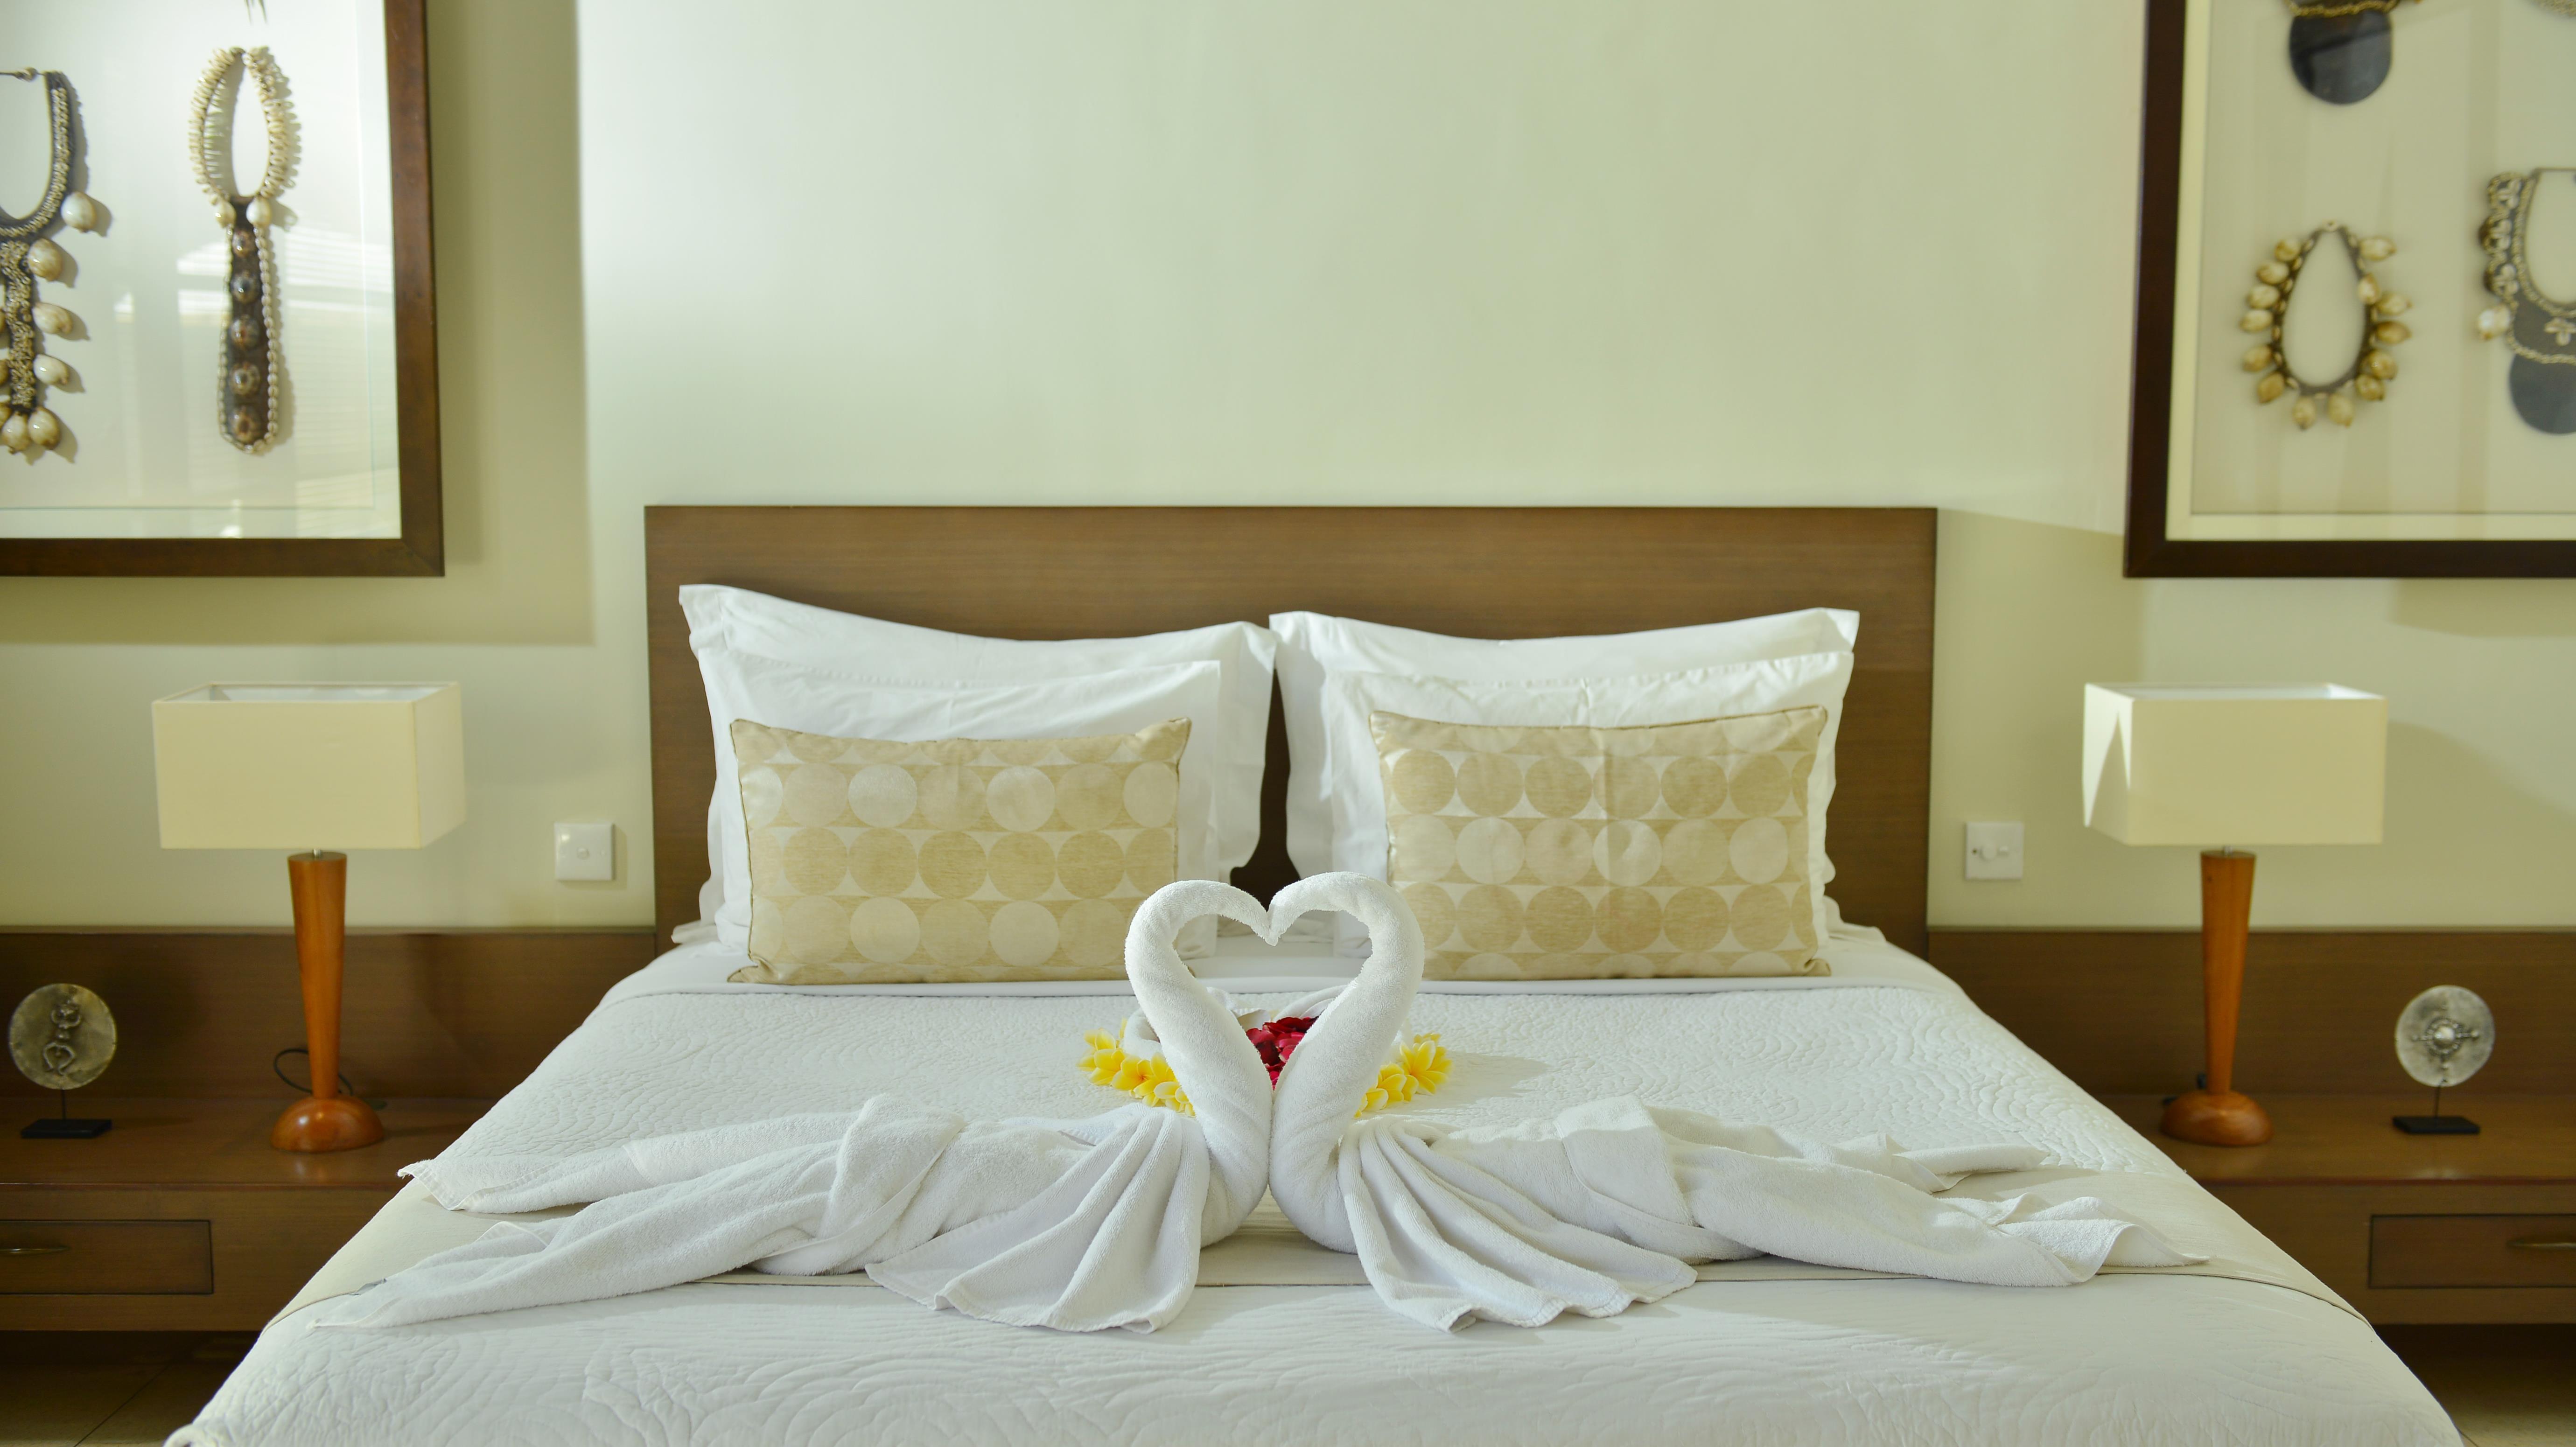 Bedroom with Table Lamps - Nyaman Villas - Seminyak, Bali